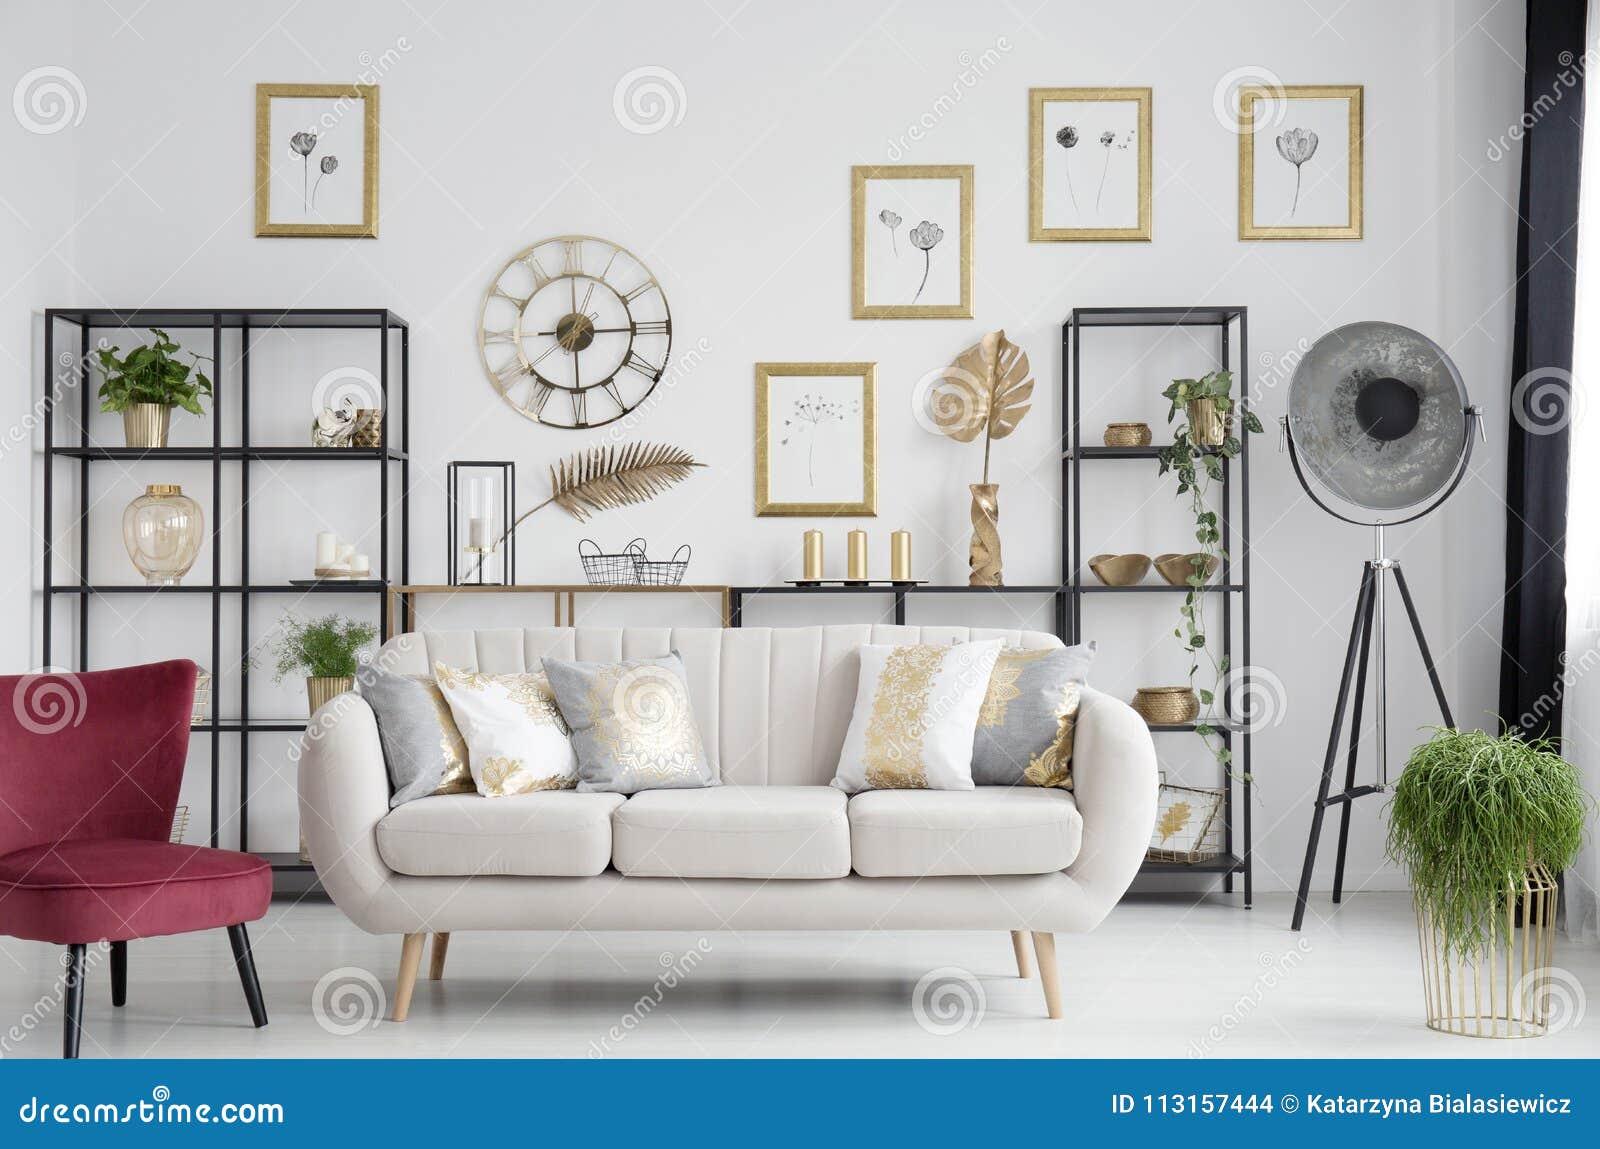 Elegant Gold Living Room Interior Stock Photo - Image of elegant ...